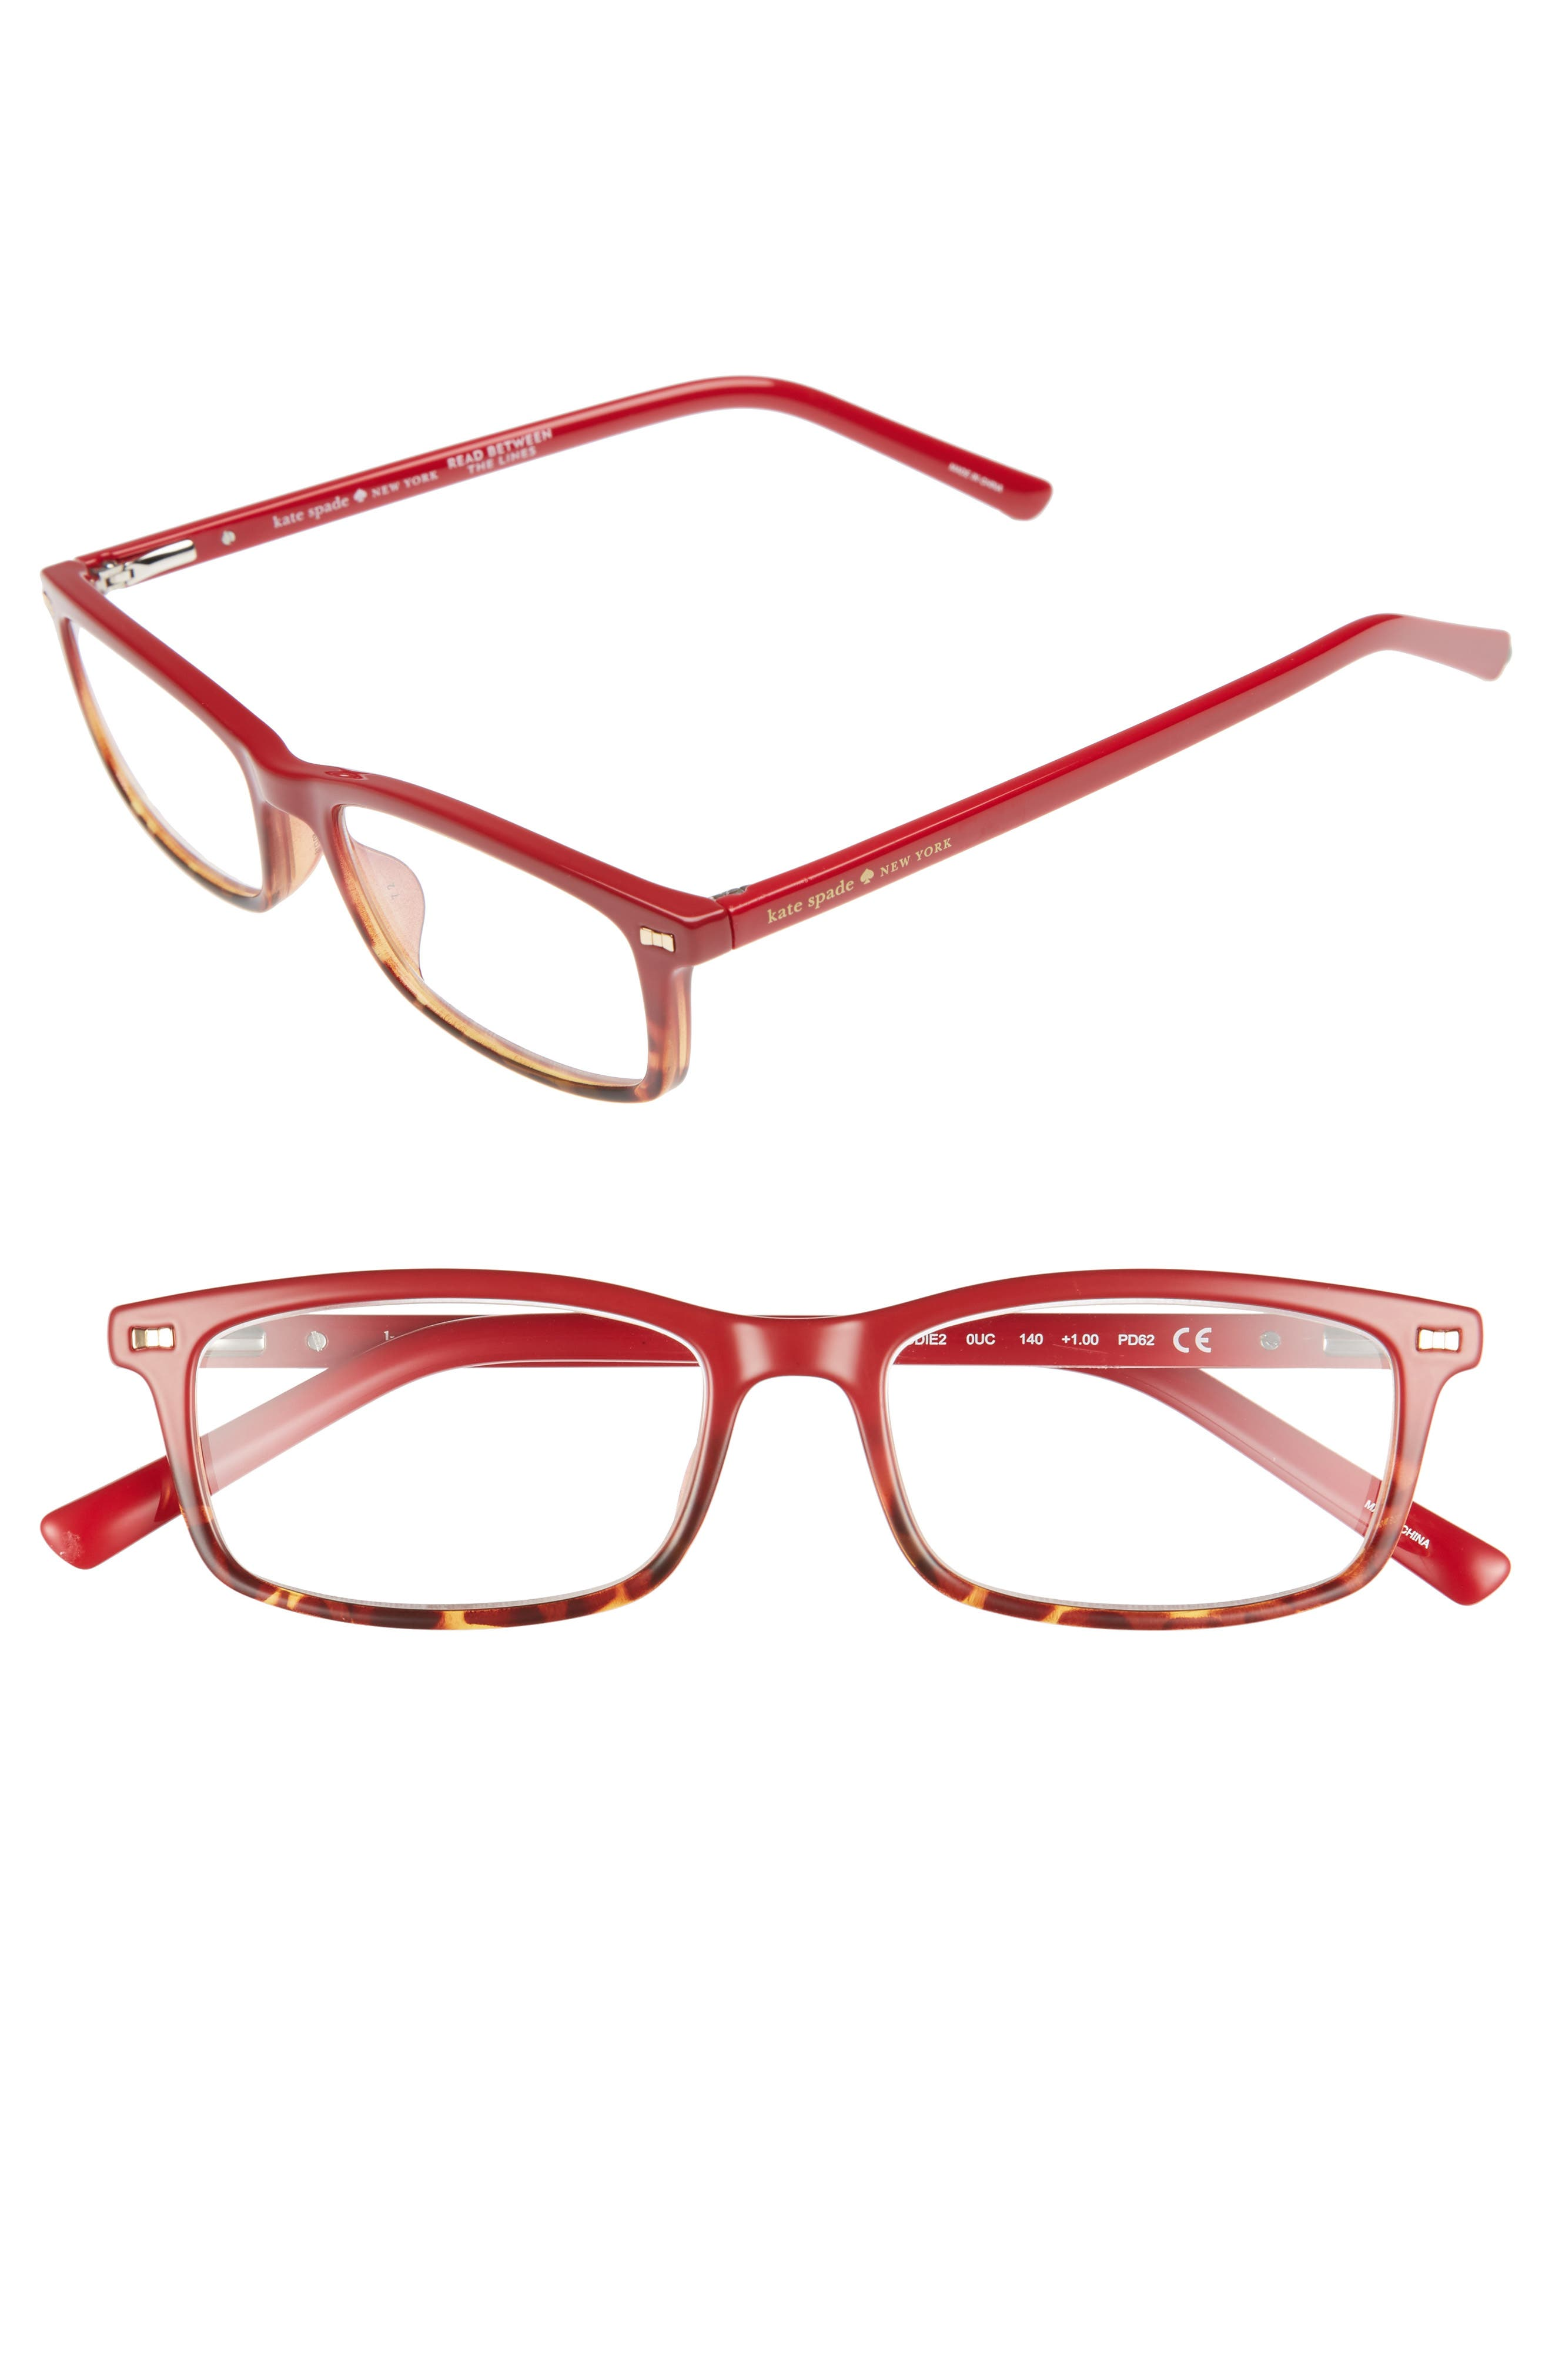 kate spade new york jodie 50mm rectangular reading glasses